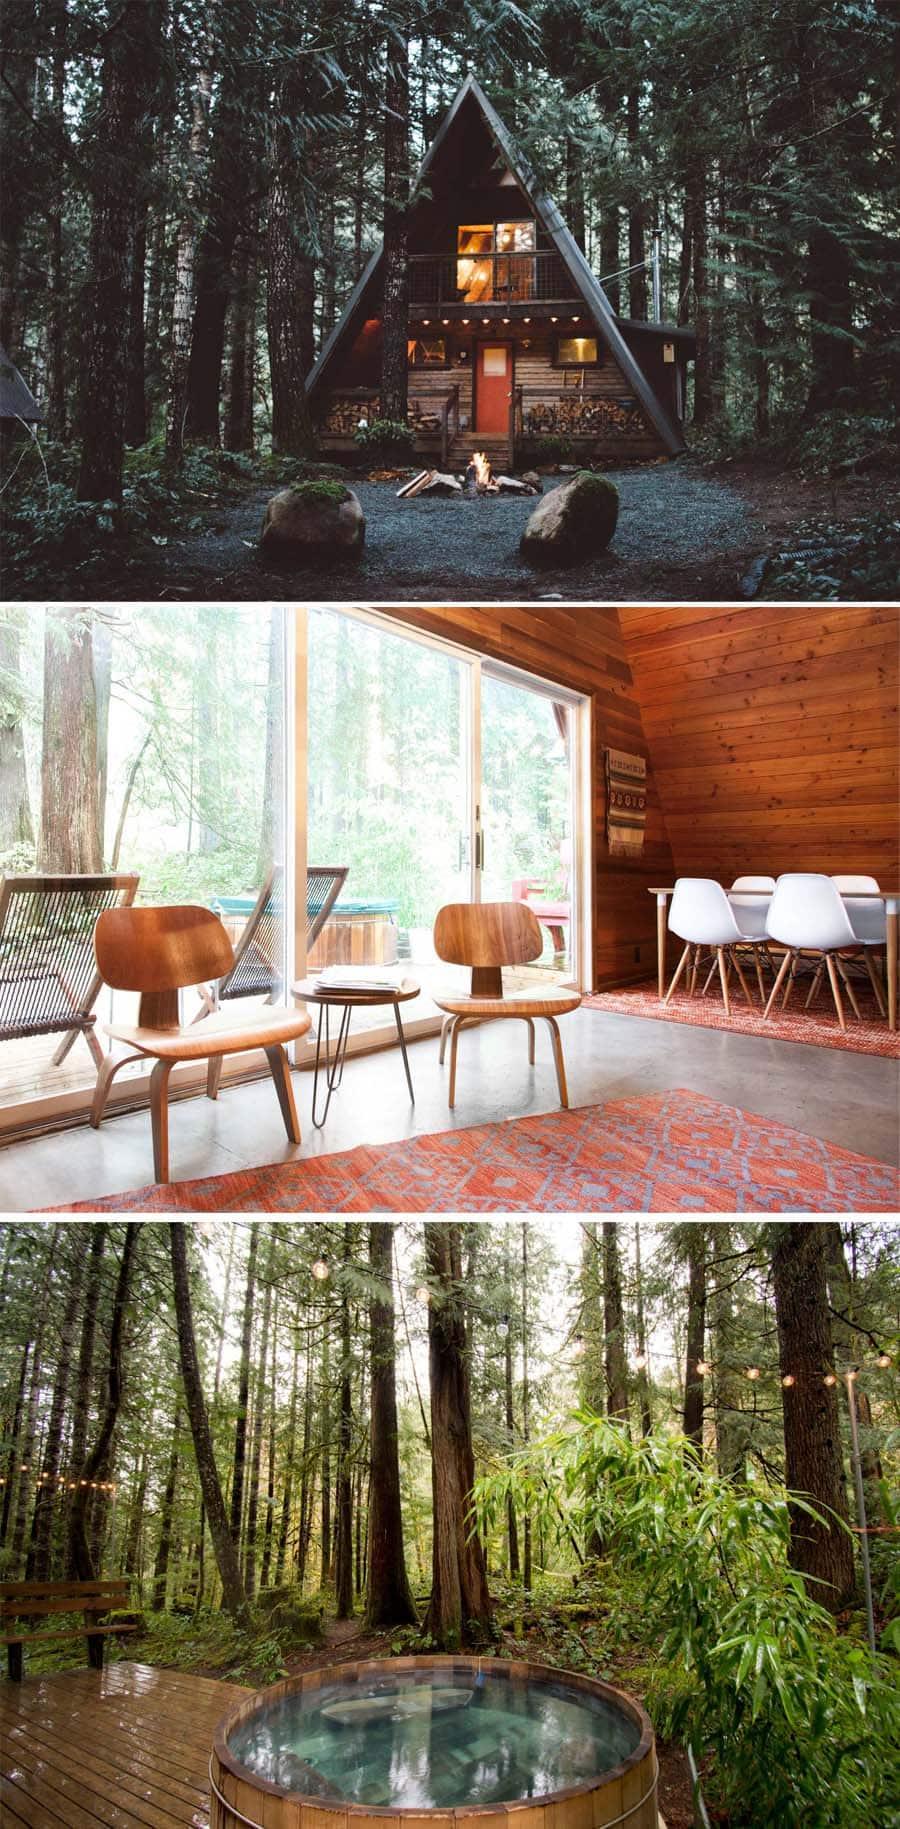 A-Frame Mt. Rainier Airbnb in Washington state